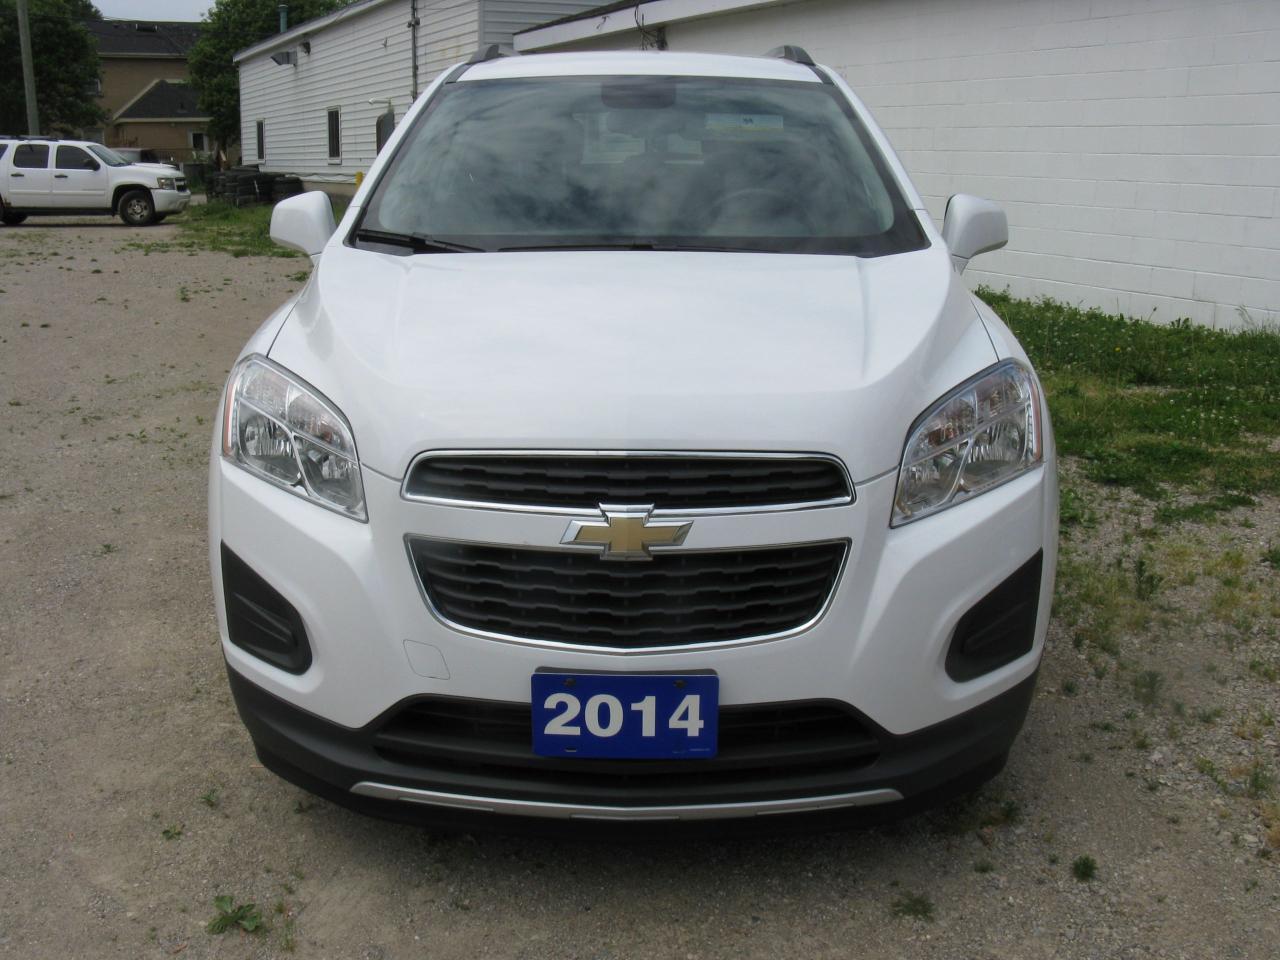 Photo of White 2014 Chevrolet Trax